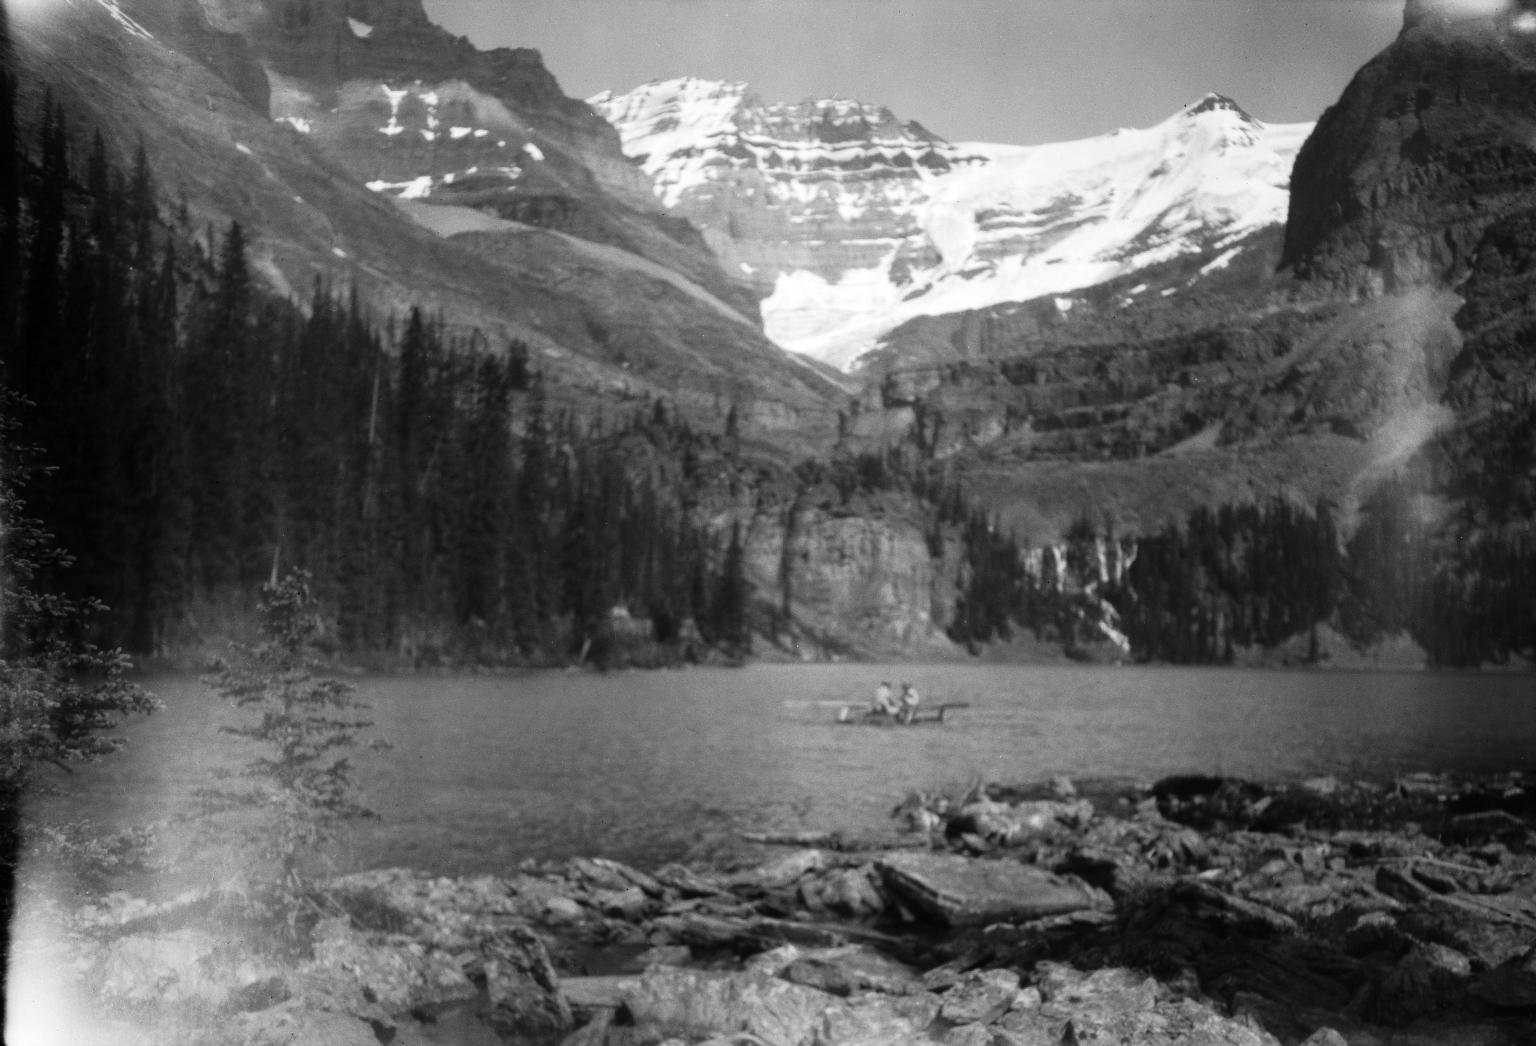 Unknown glacier, Lake O'Hara, British Columbia, Canada